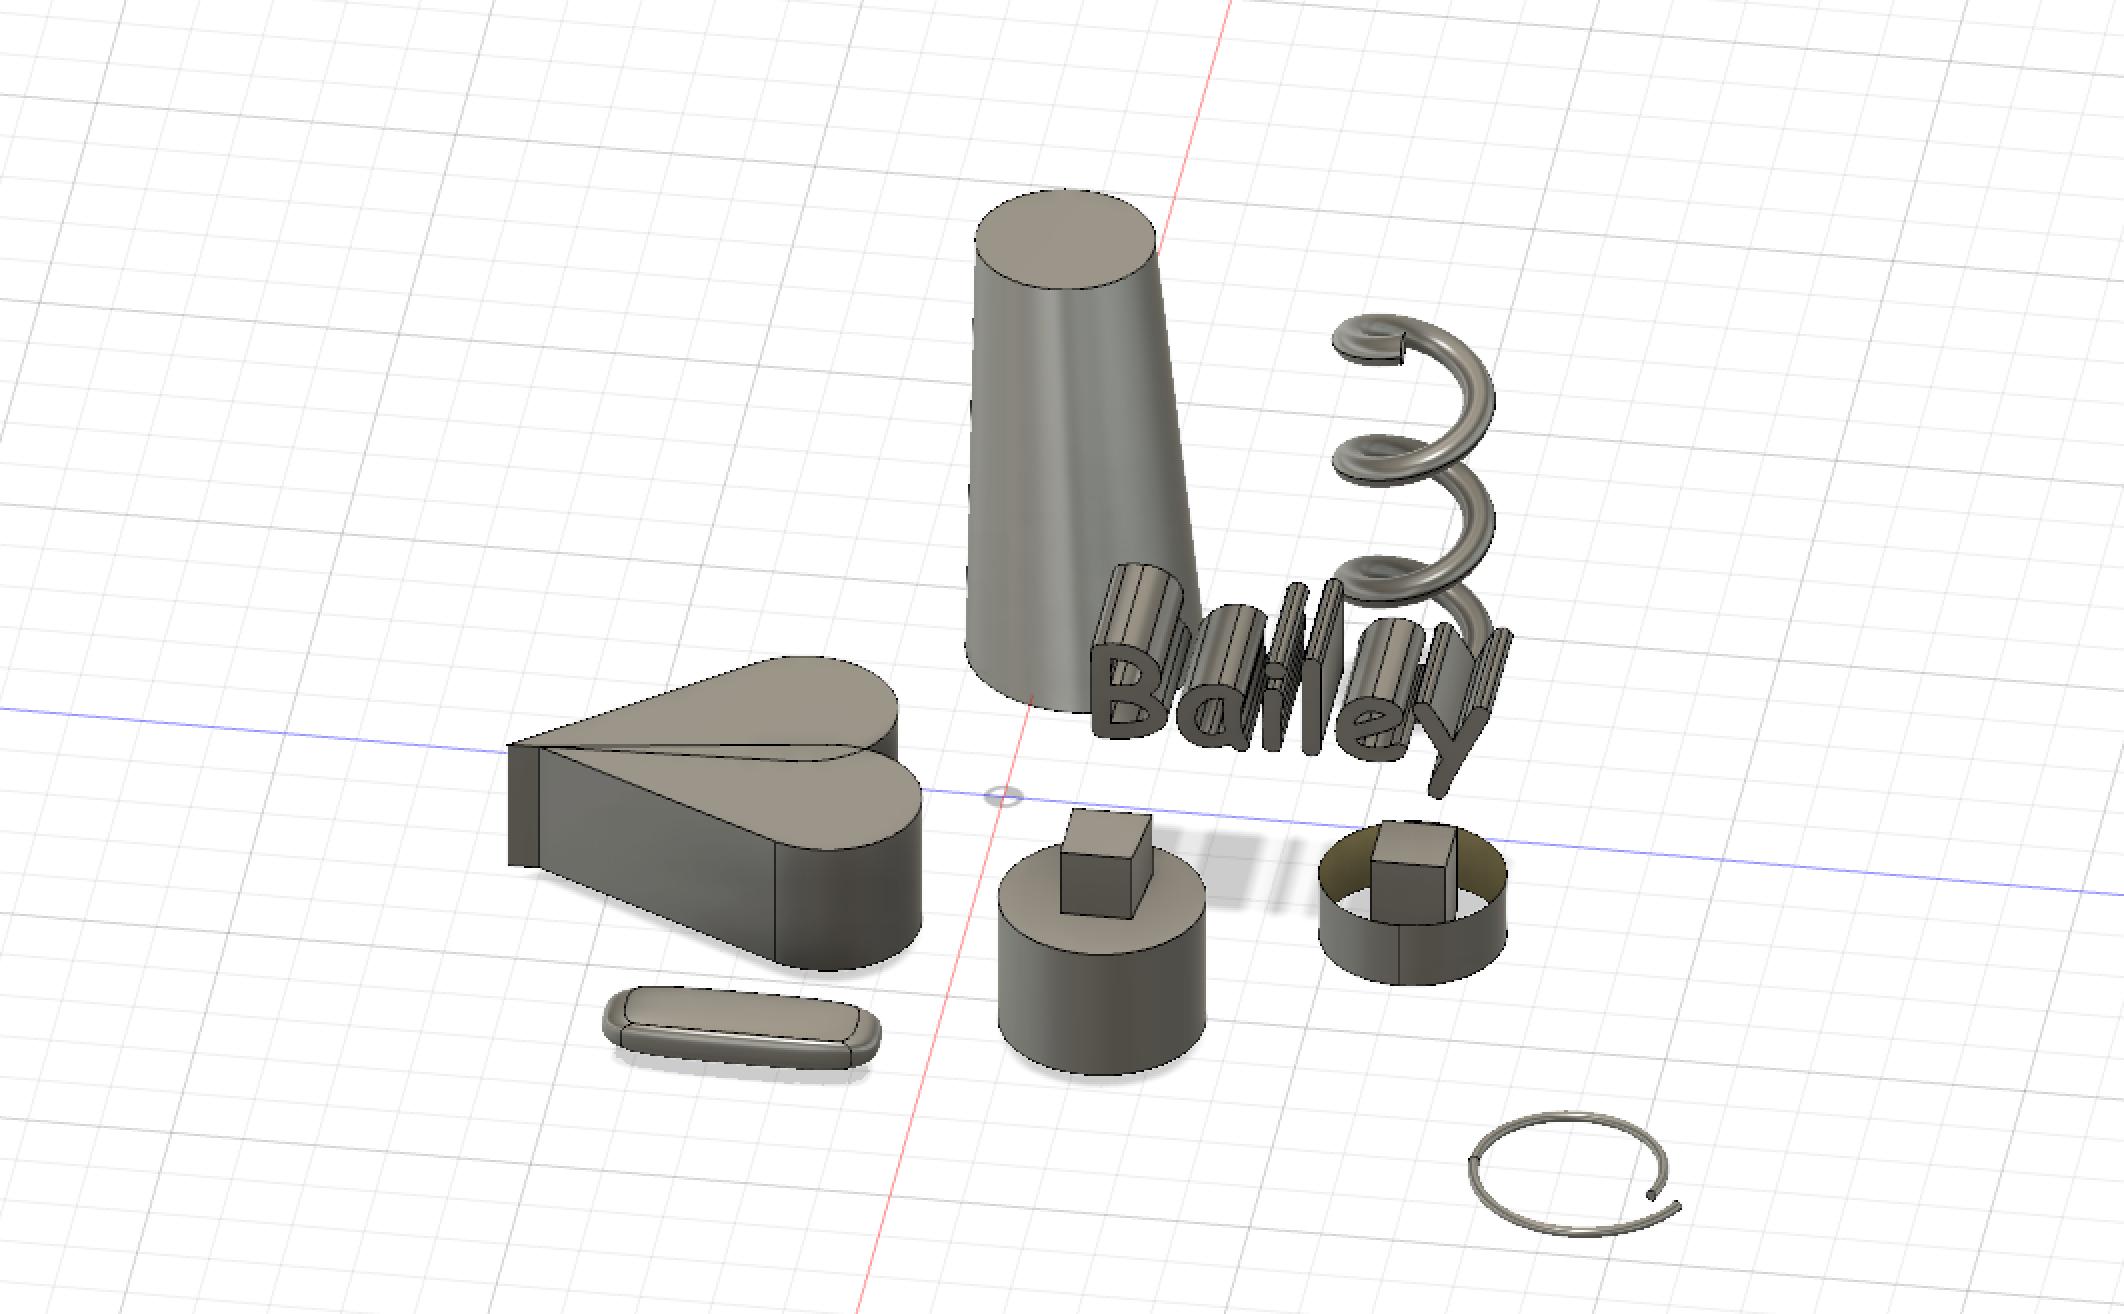 Bailey Callahan Portfolio – Introduction to 3D Printing and